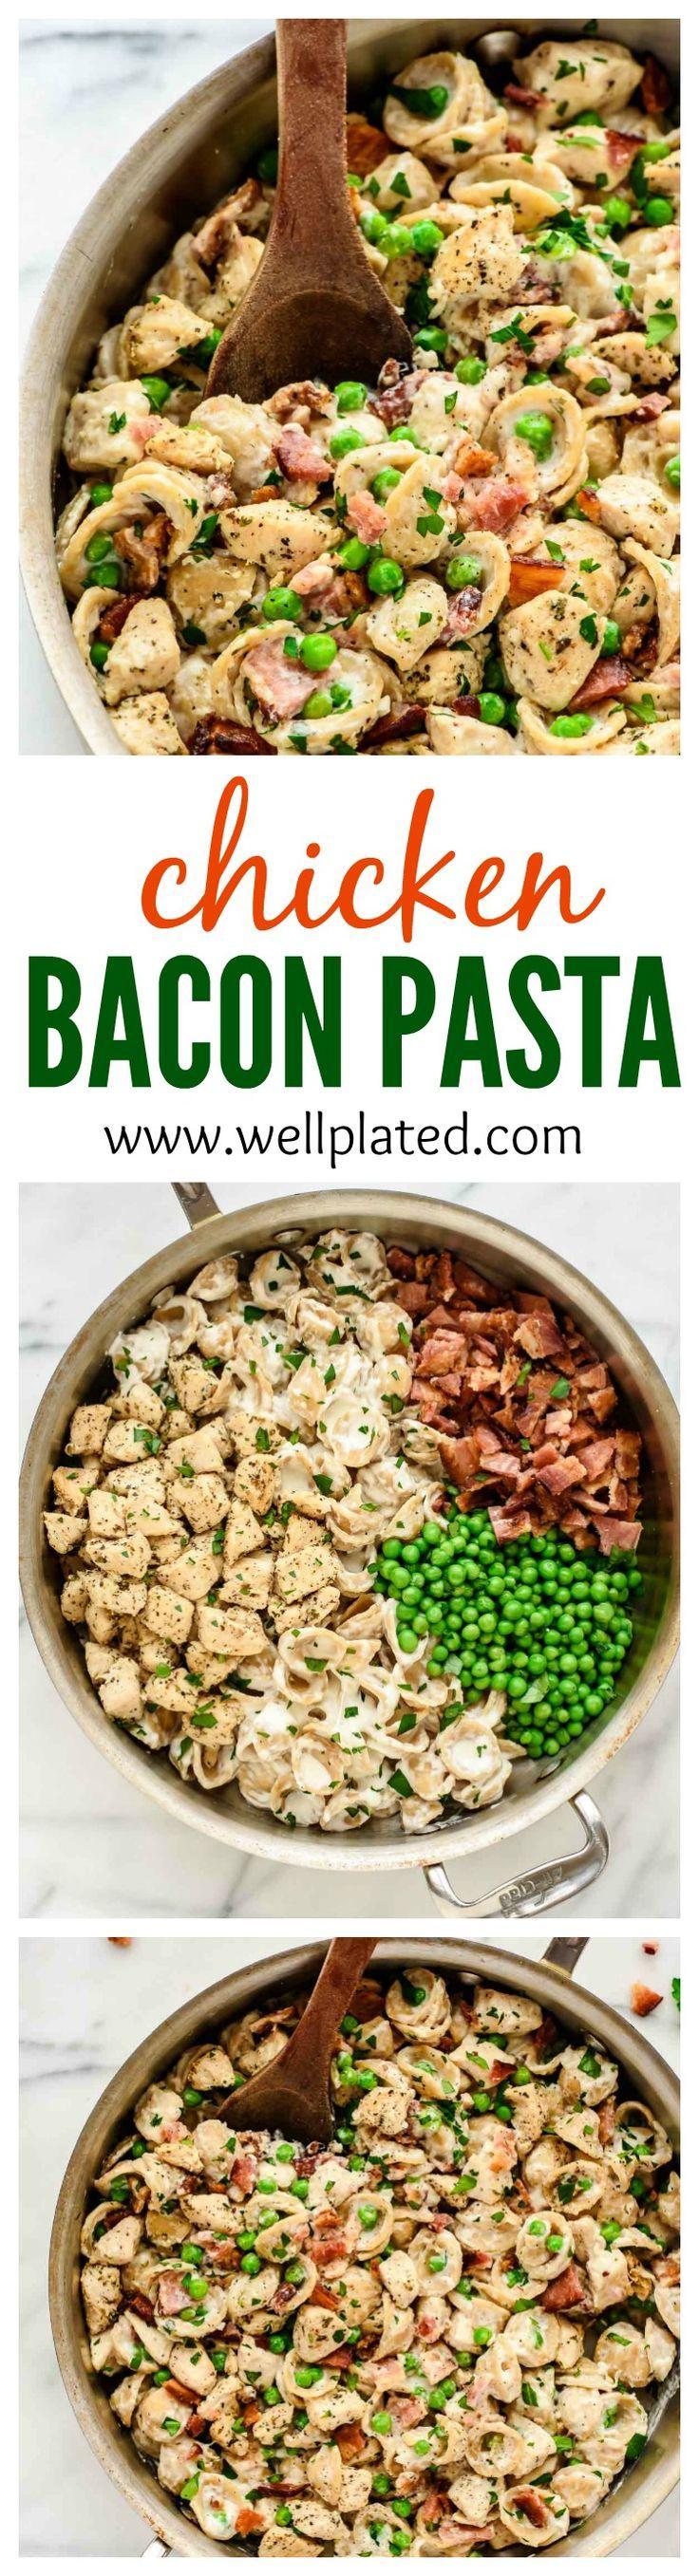 Creamy Chicken Bacon Pasta with Peas